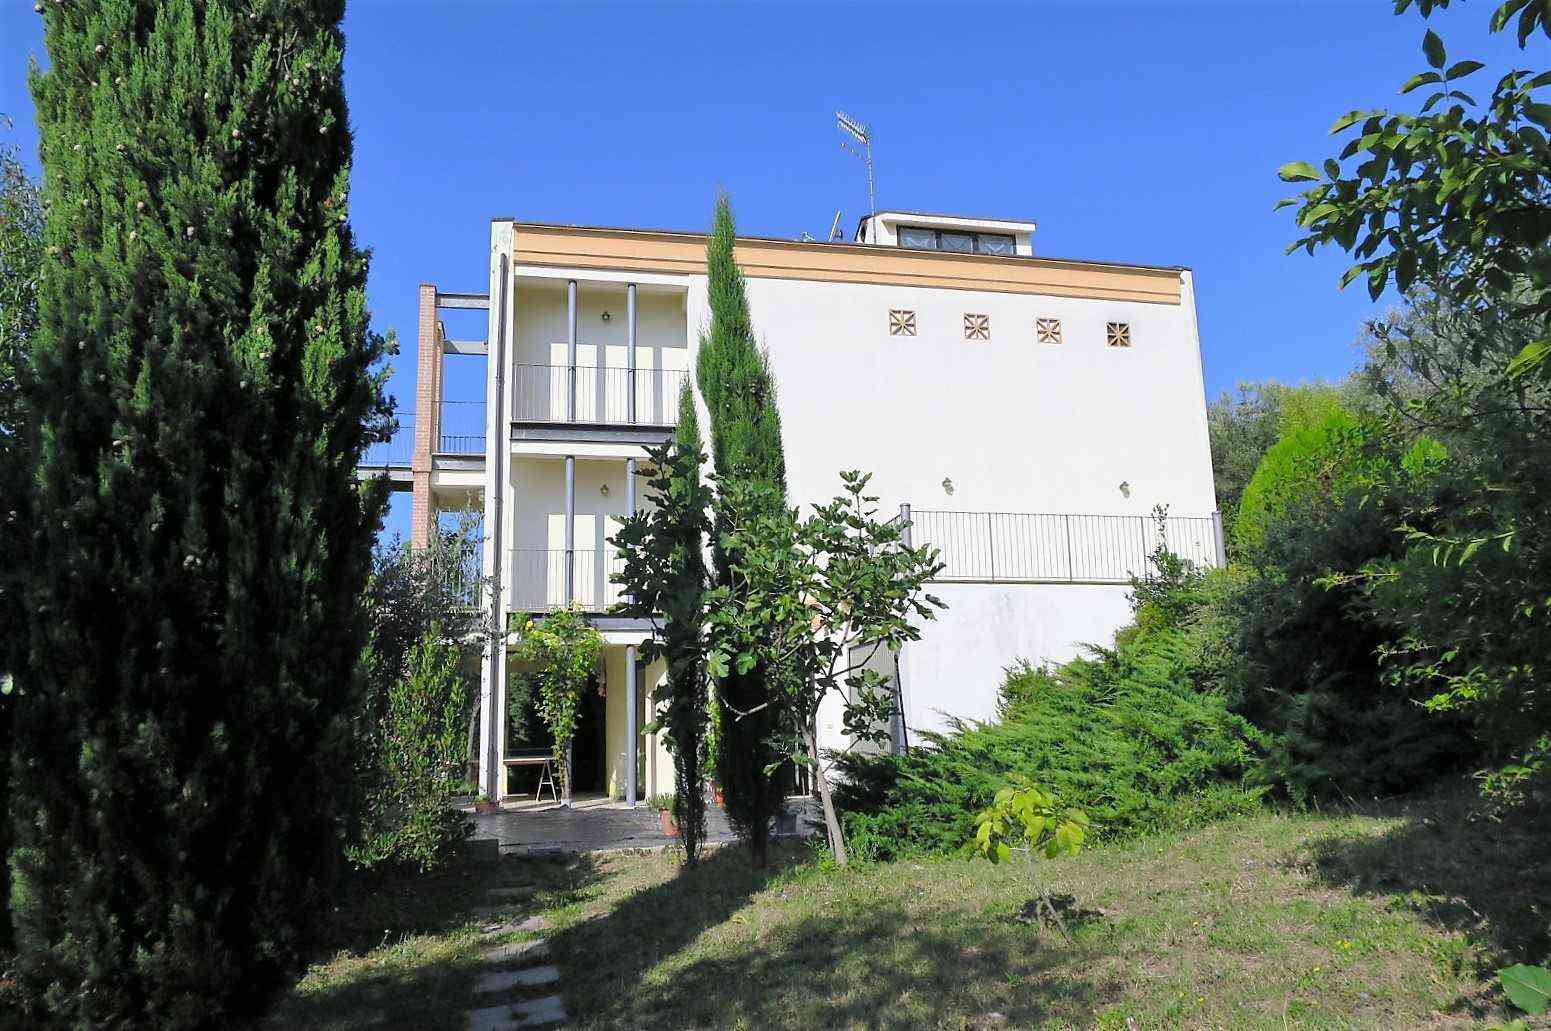 Villa Villa in vendita Atri (TE), Villa Paola - Atri - EUR 473.281 10